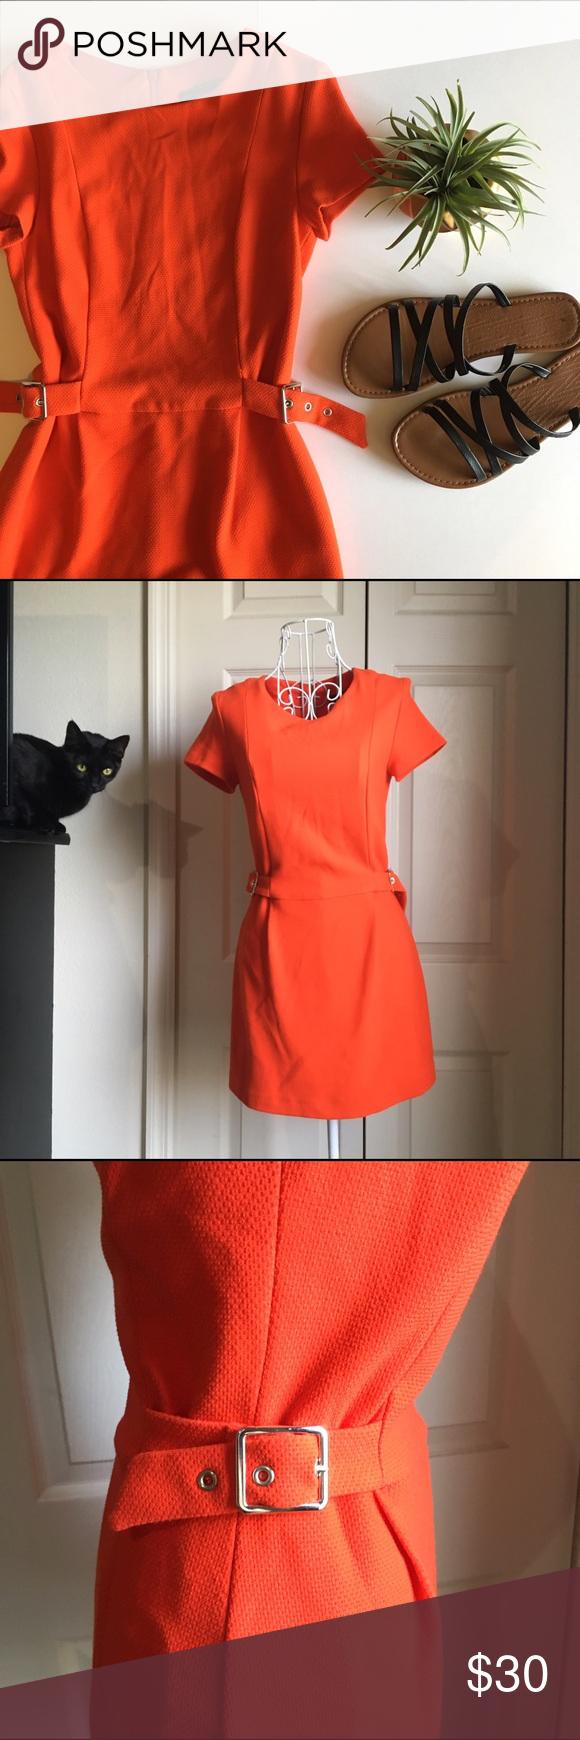 3aafdf2d9d9 ZARA Trafaluc Geranium jumpsuit dress Sophisticated and stylish Zara  Trafaluc Collection jumpsuit dress in burnt orange